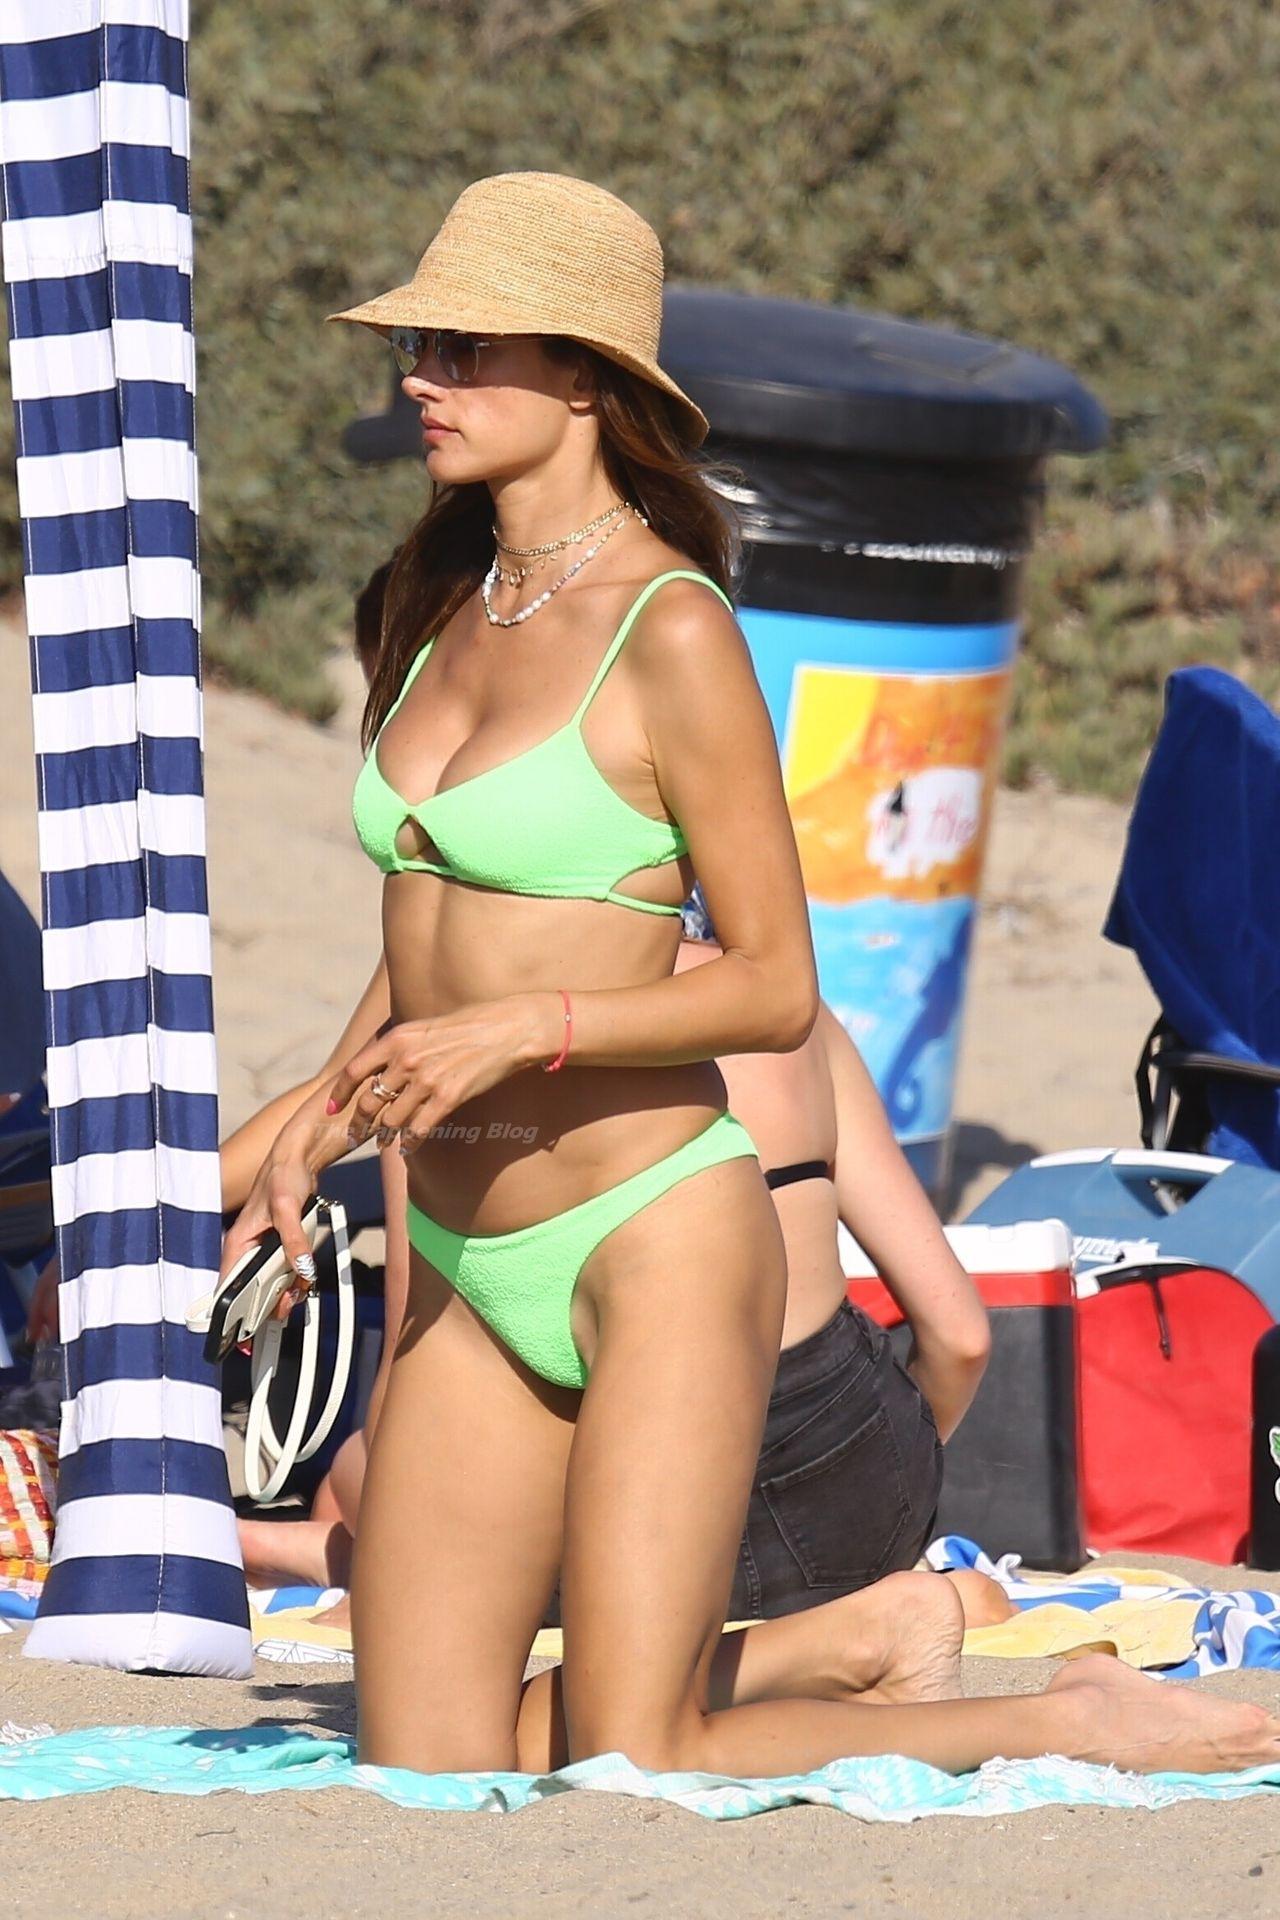 Alessandra-Ambrosio-Sexy-The-Fappening-Blog-941.jpg